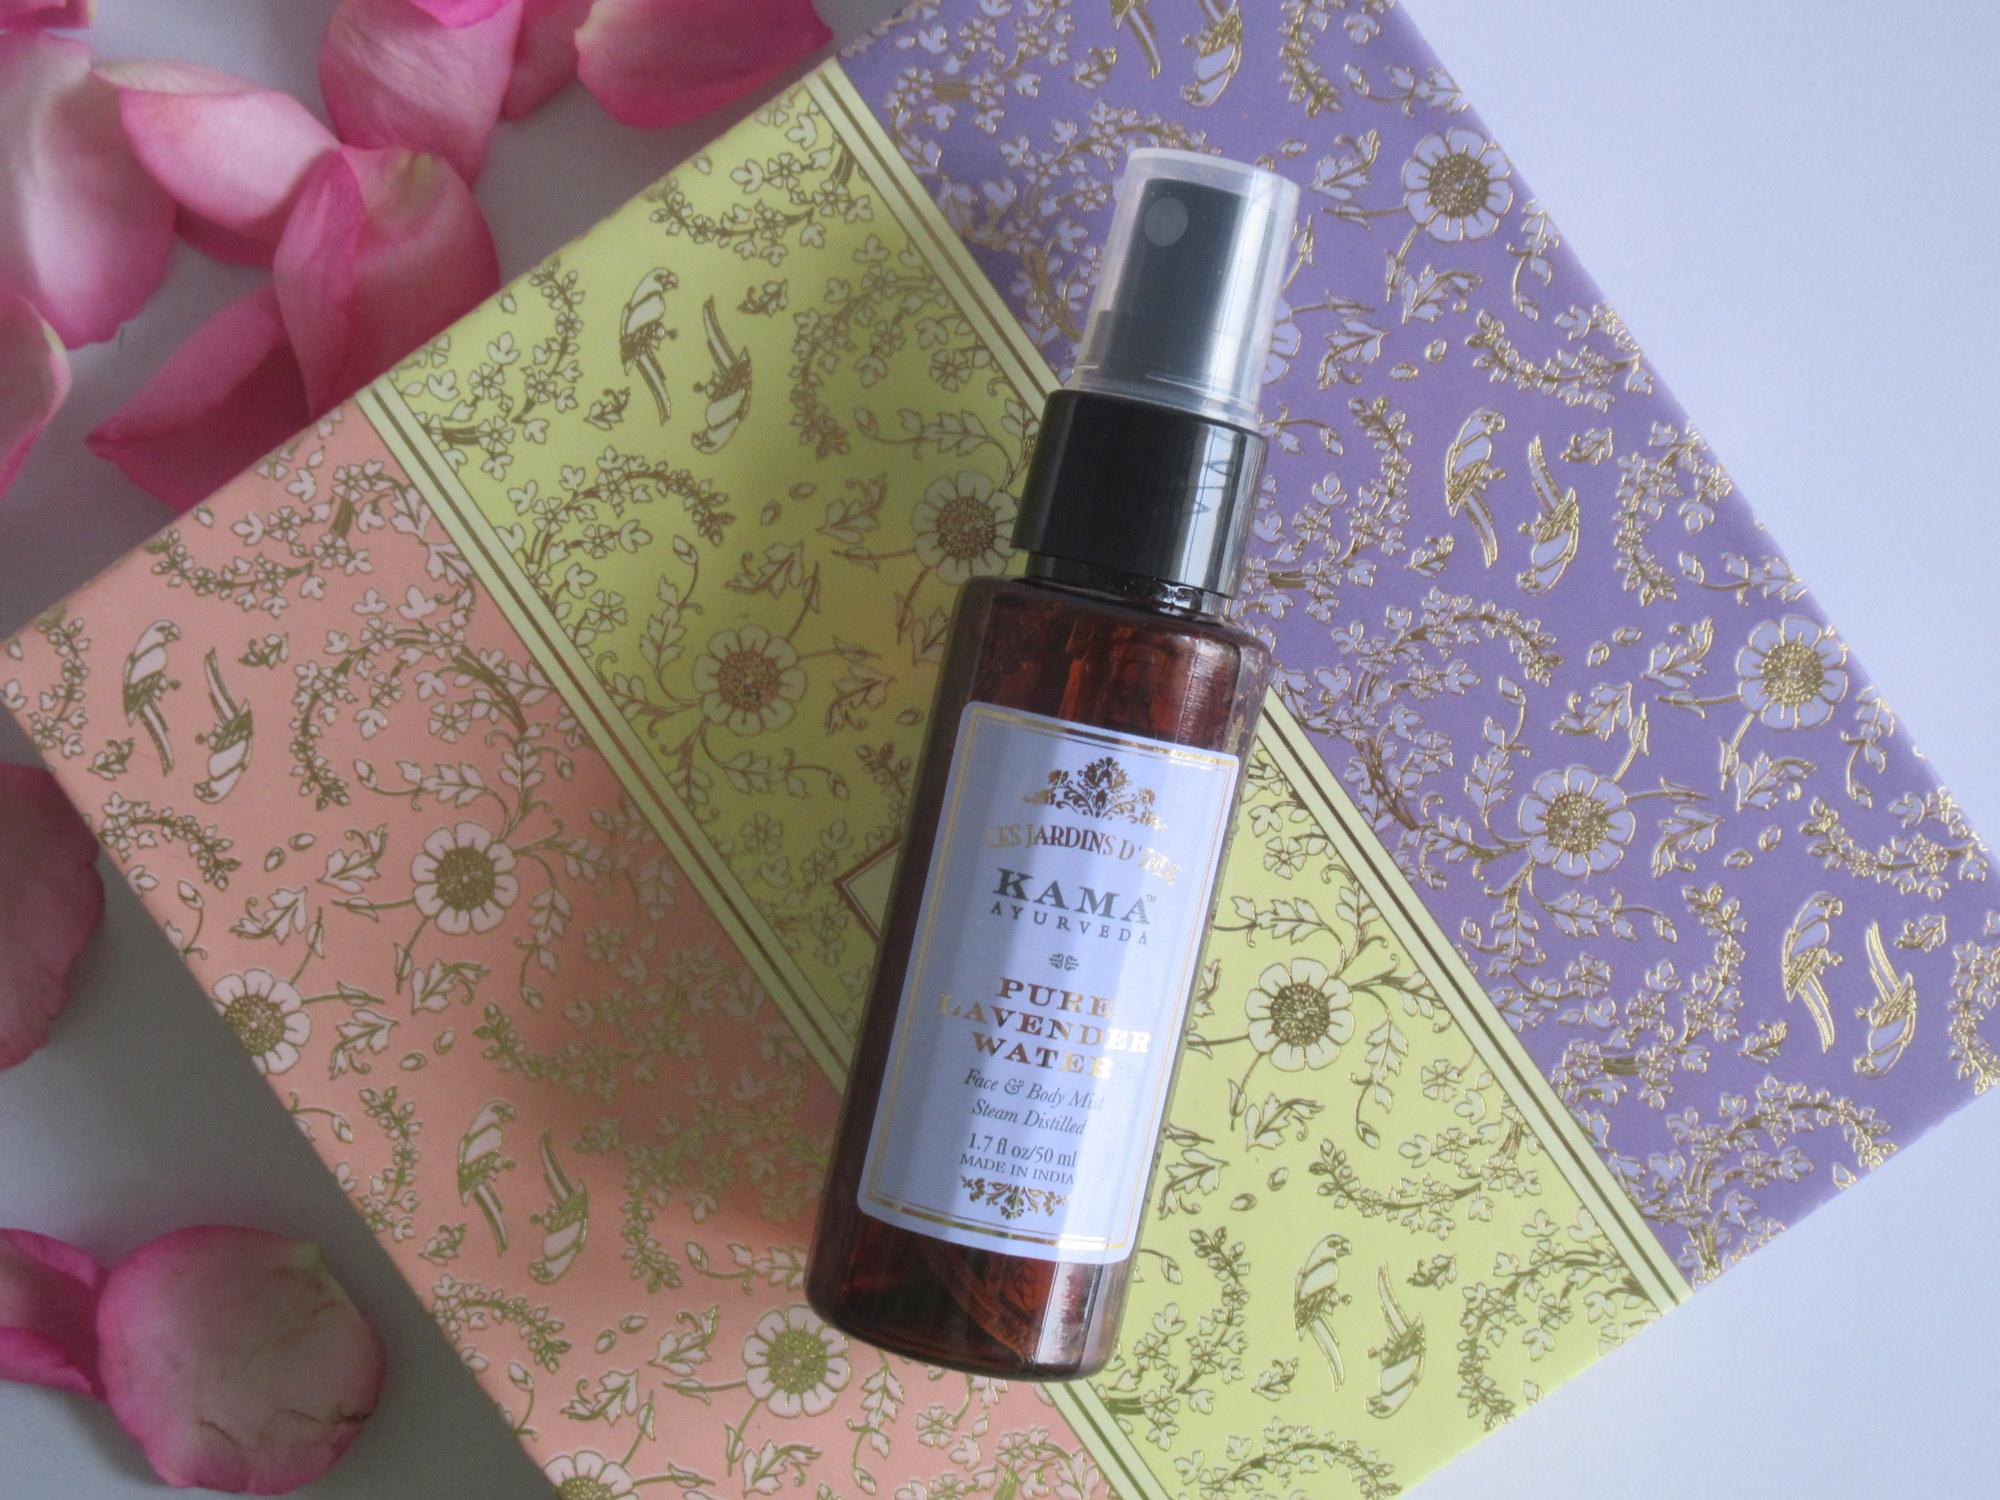 kama ayurveda pure floral mist box, kama ayurveda pure rose water, kama ayurveda pure mogra water, kama ayurveda pure lavender water